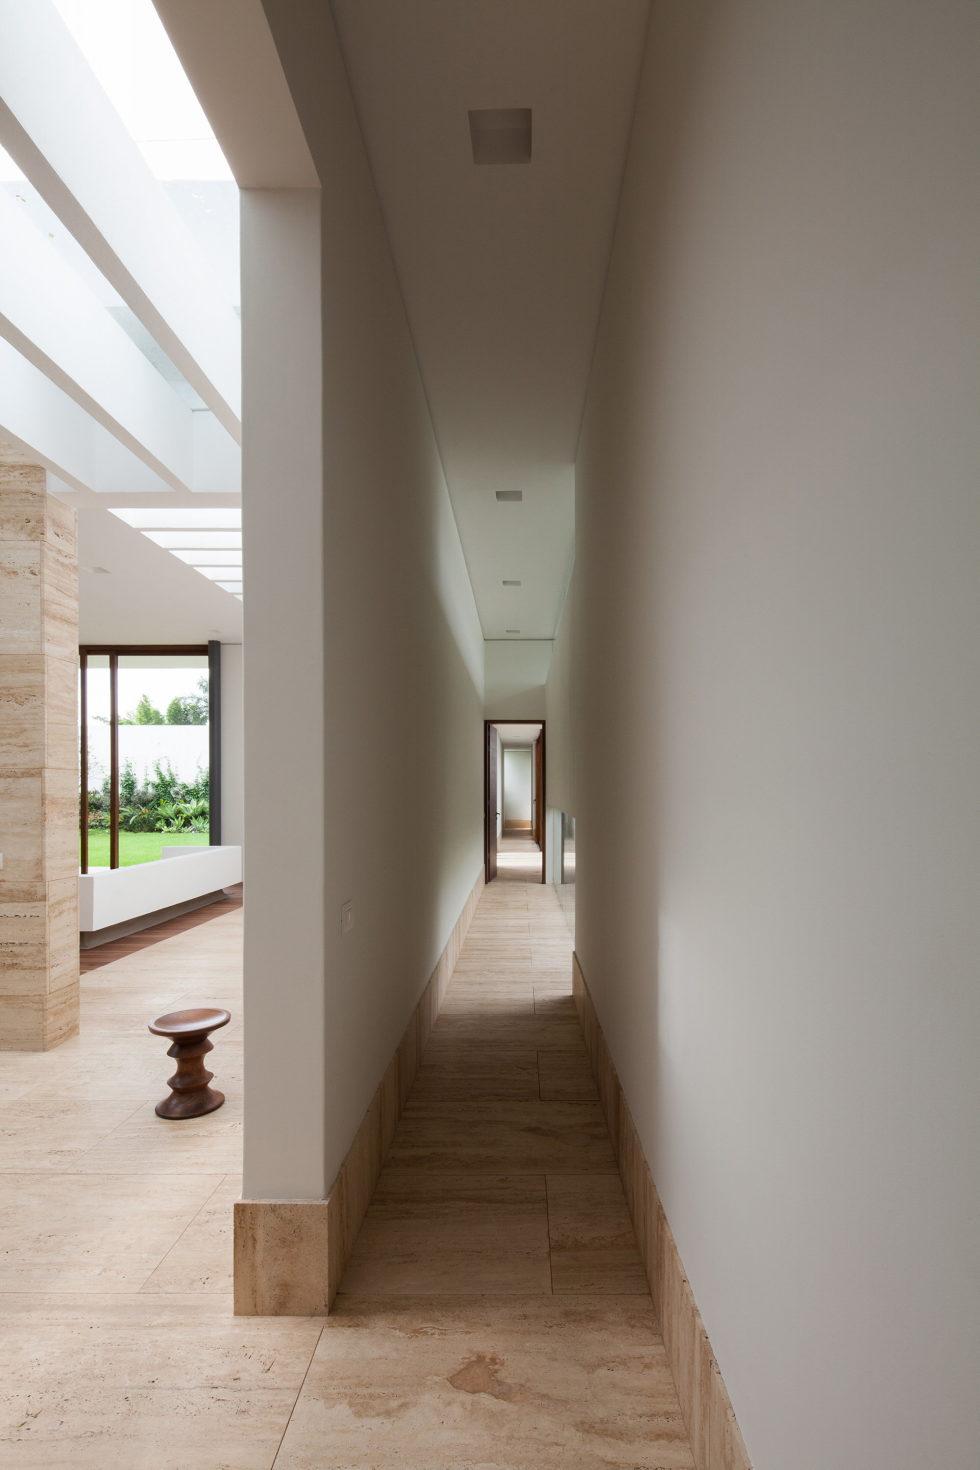 Casa Ocho Jardines Residency In Minimalism Style From Goko MX Studio 13